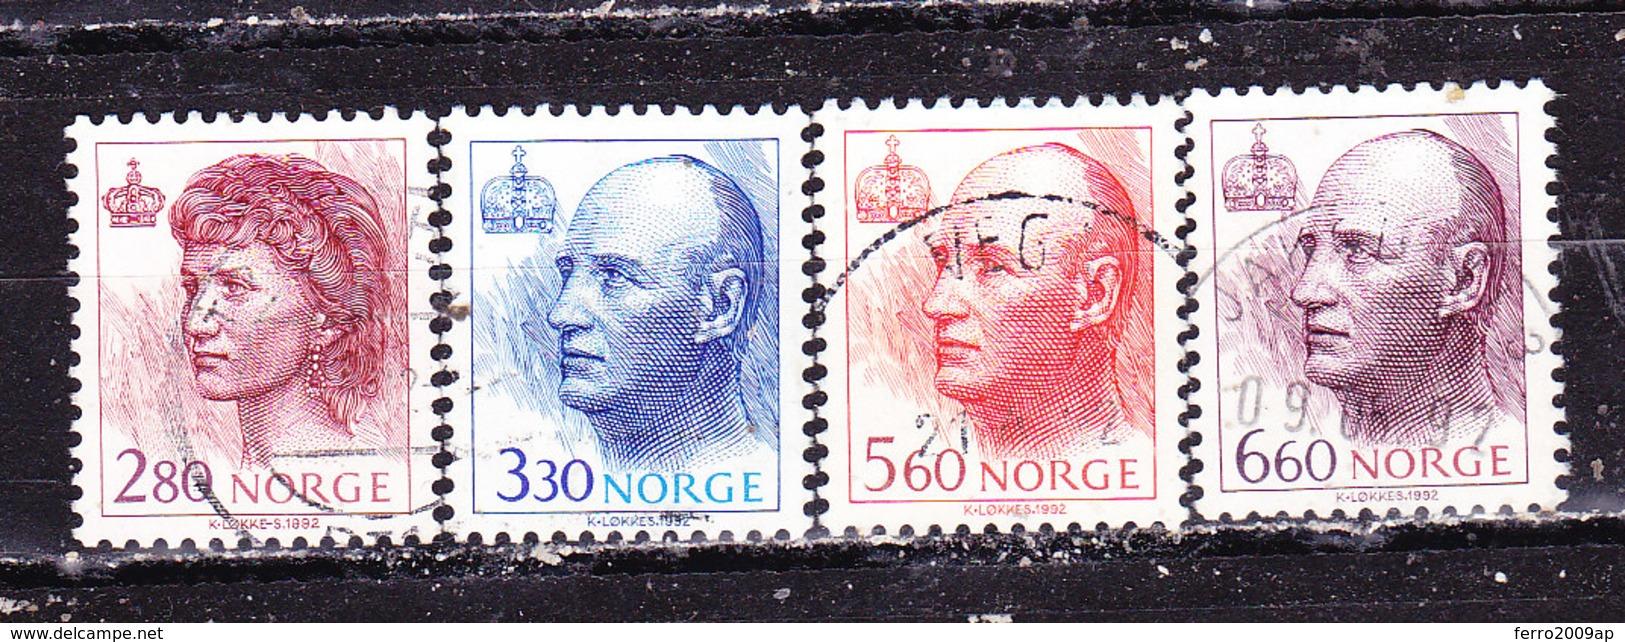 Norvegia 1992 Reali  -Serie Completa Usata - Norwegen